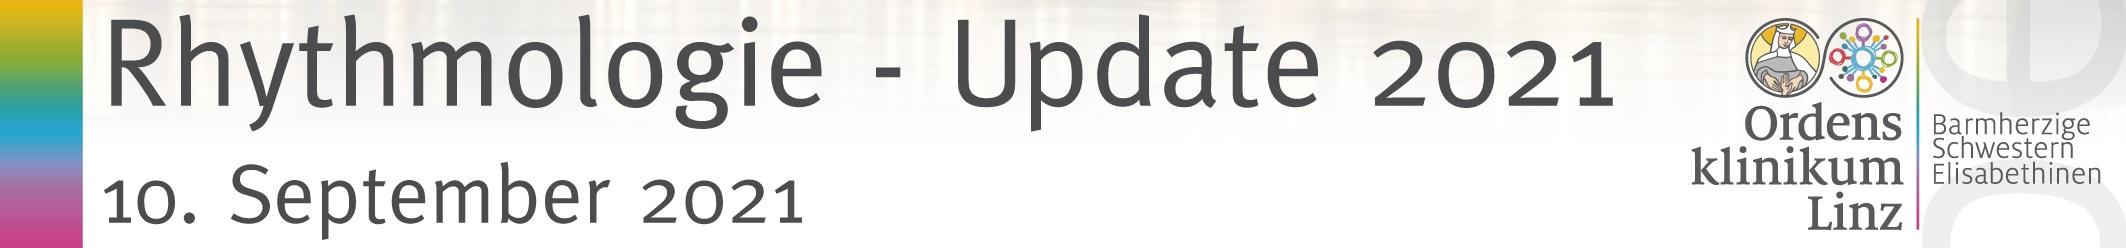 Rhythmologie – Update 2021